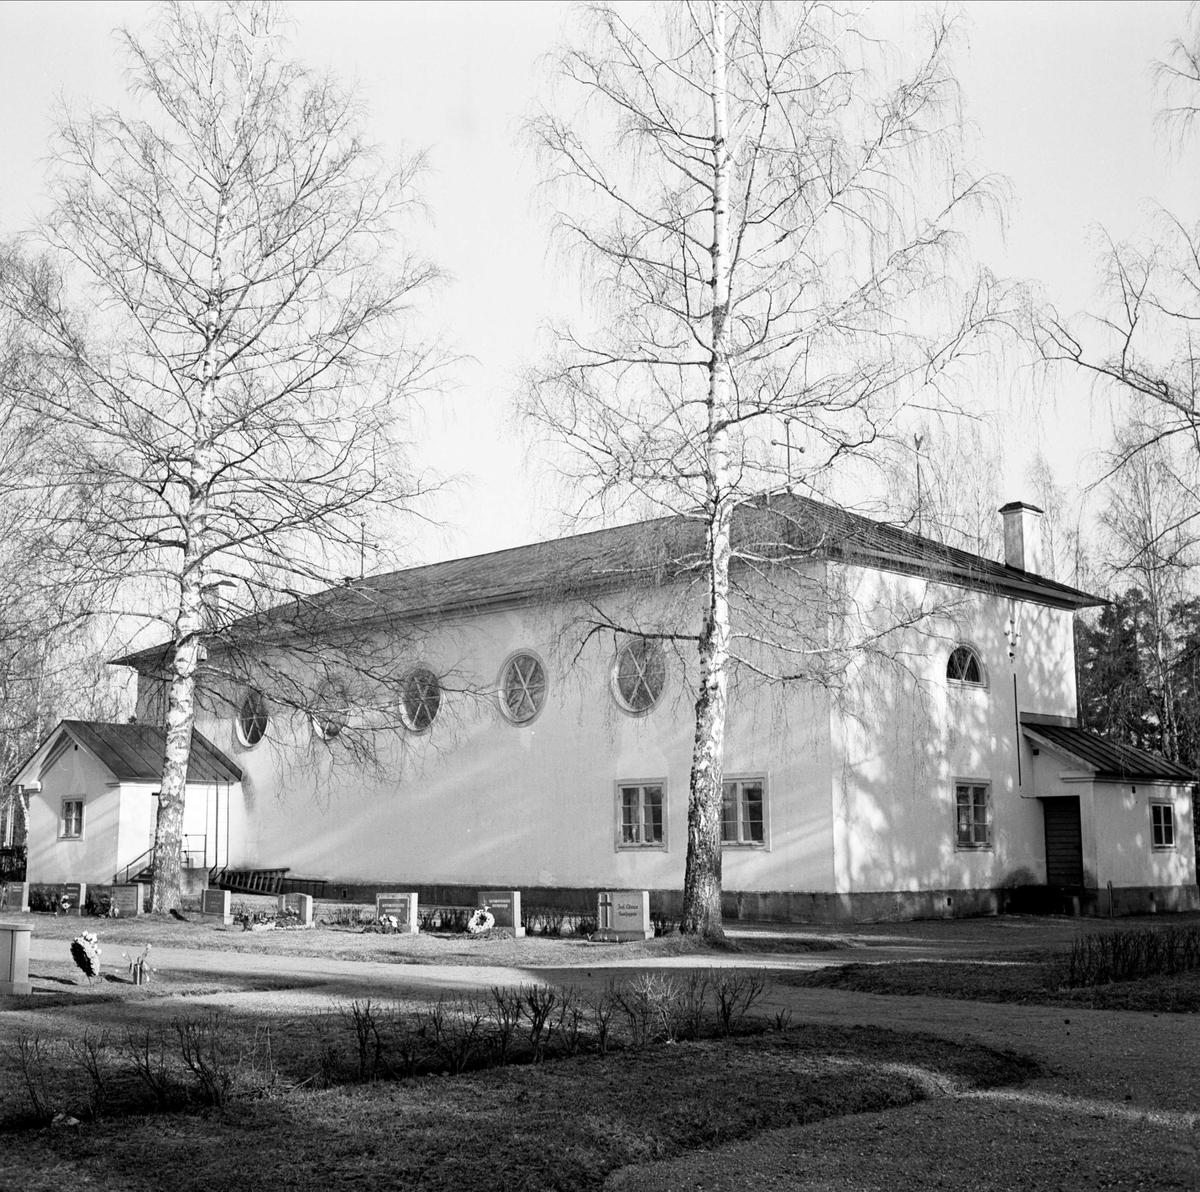 Marma kyrka, Älvkarleby, Uppland 1967